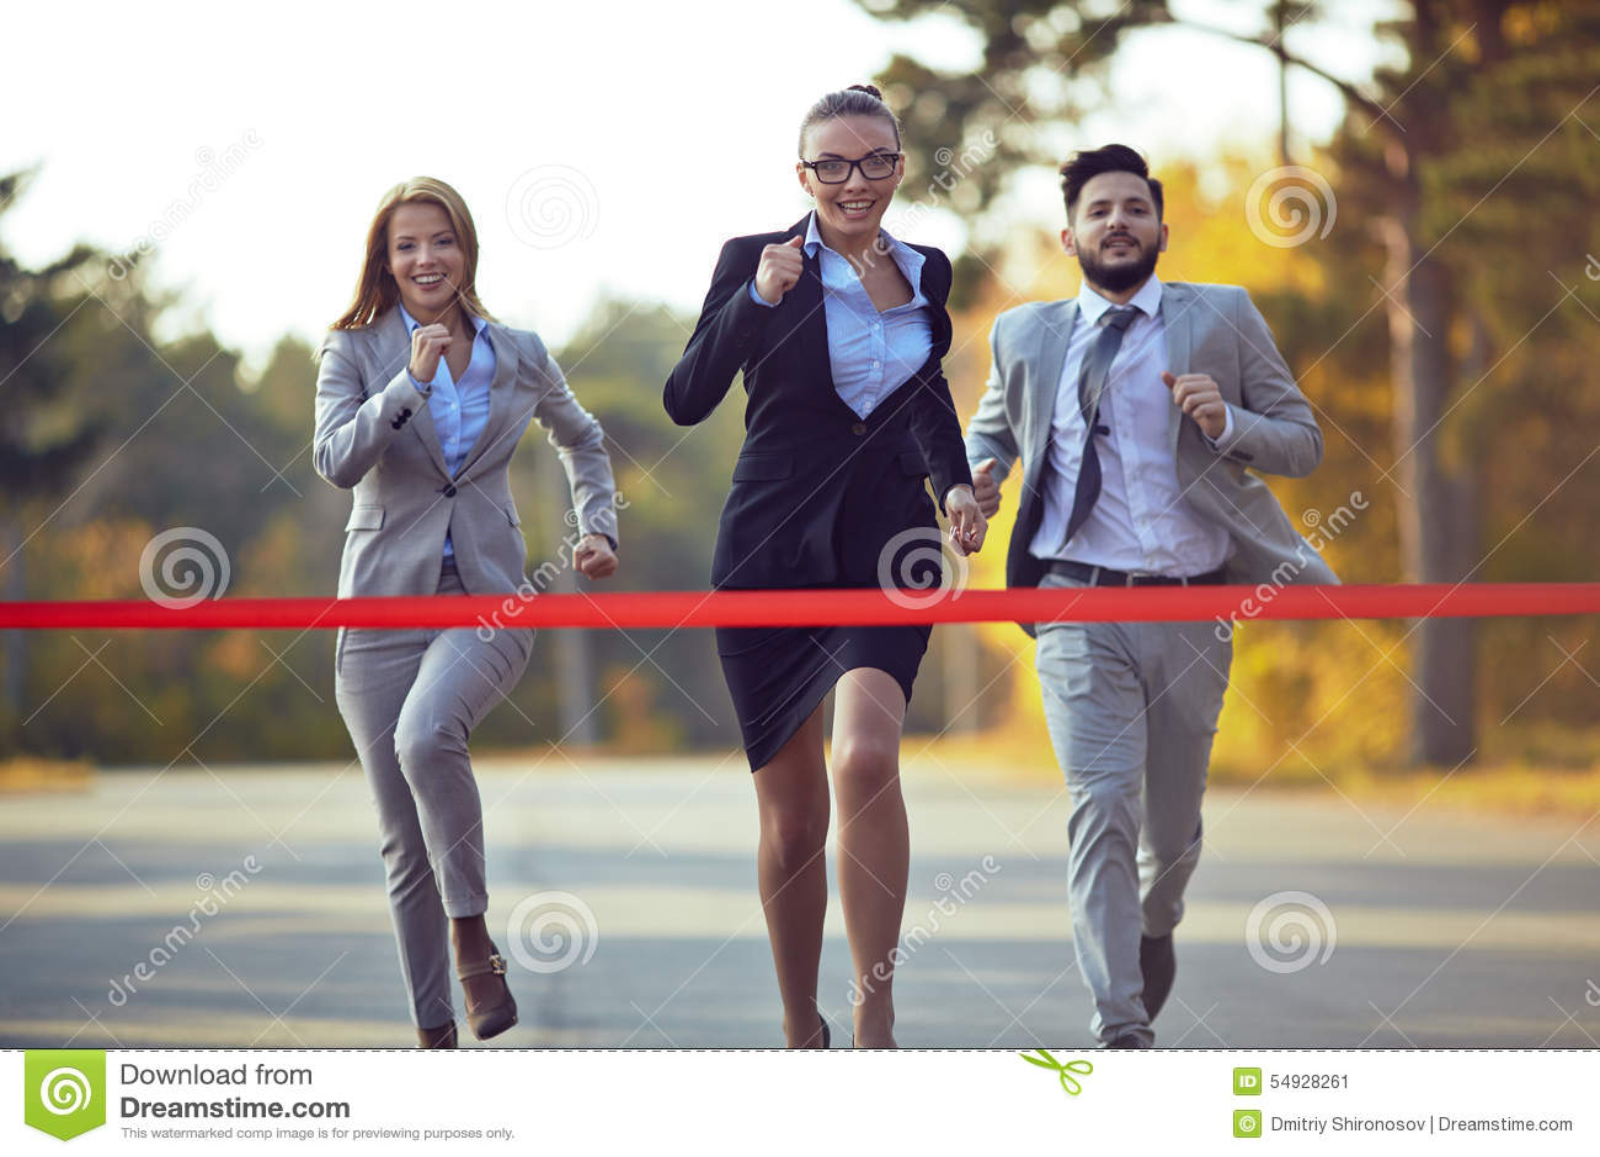 About the Omaha Half Marathon